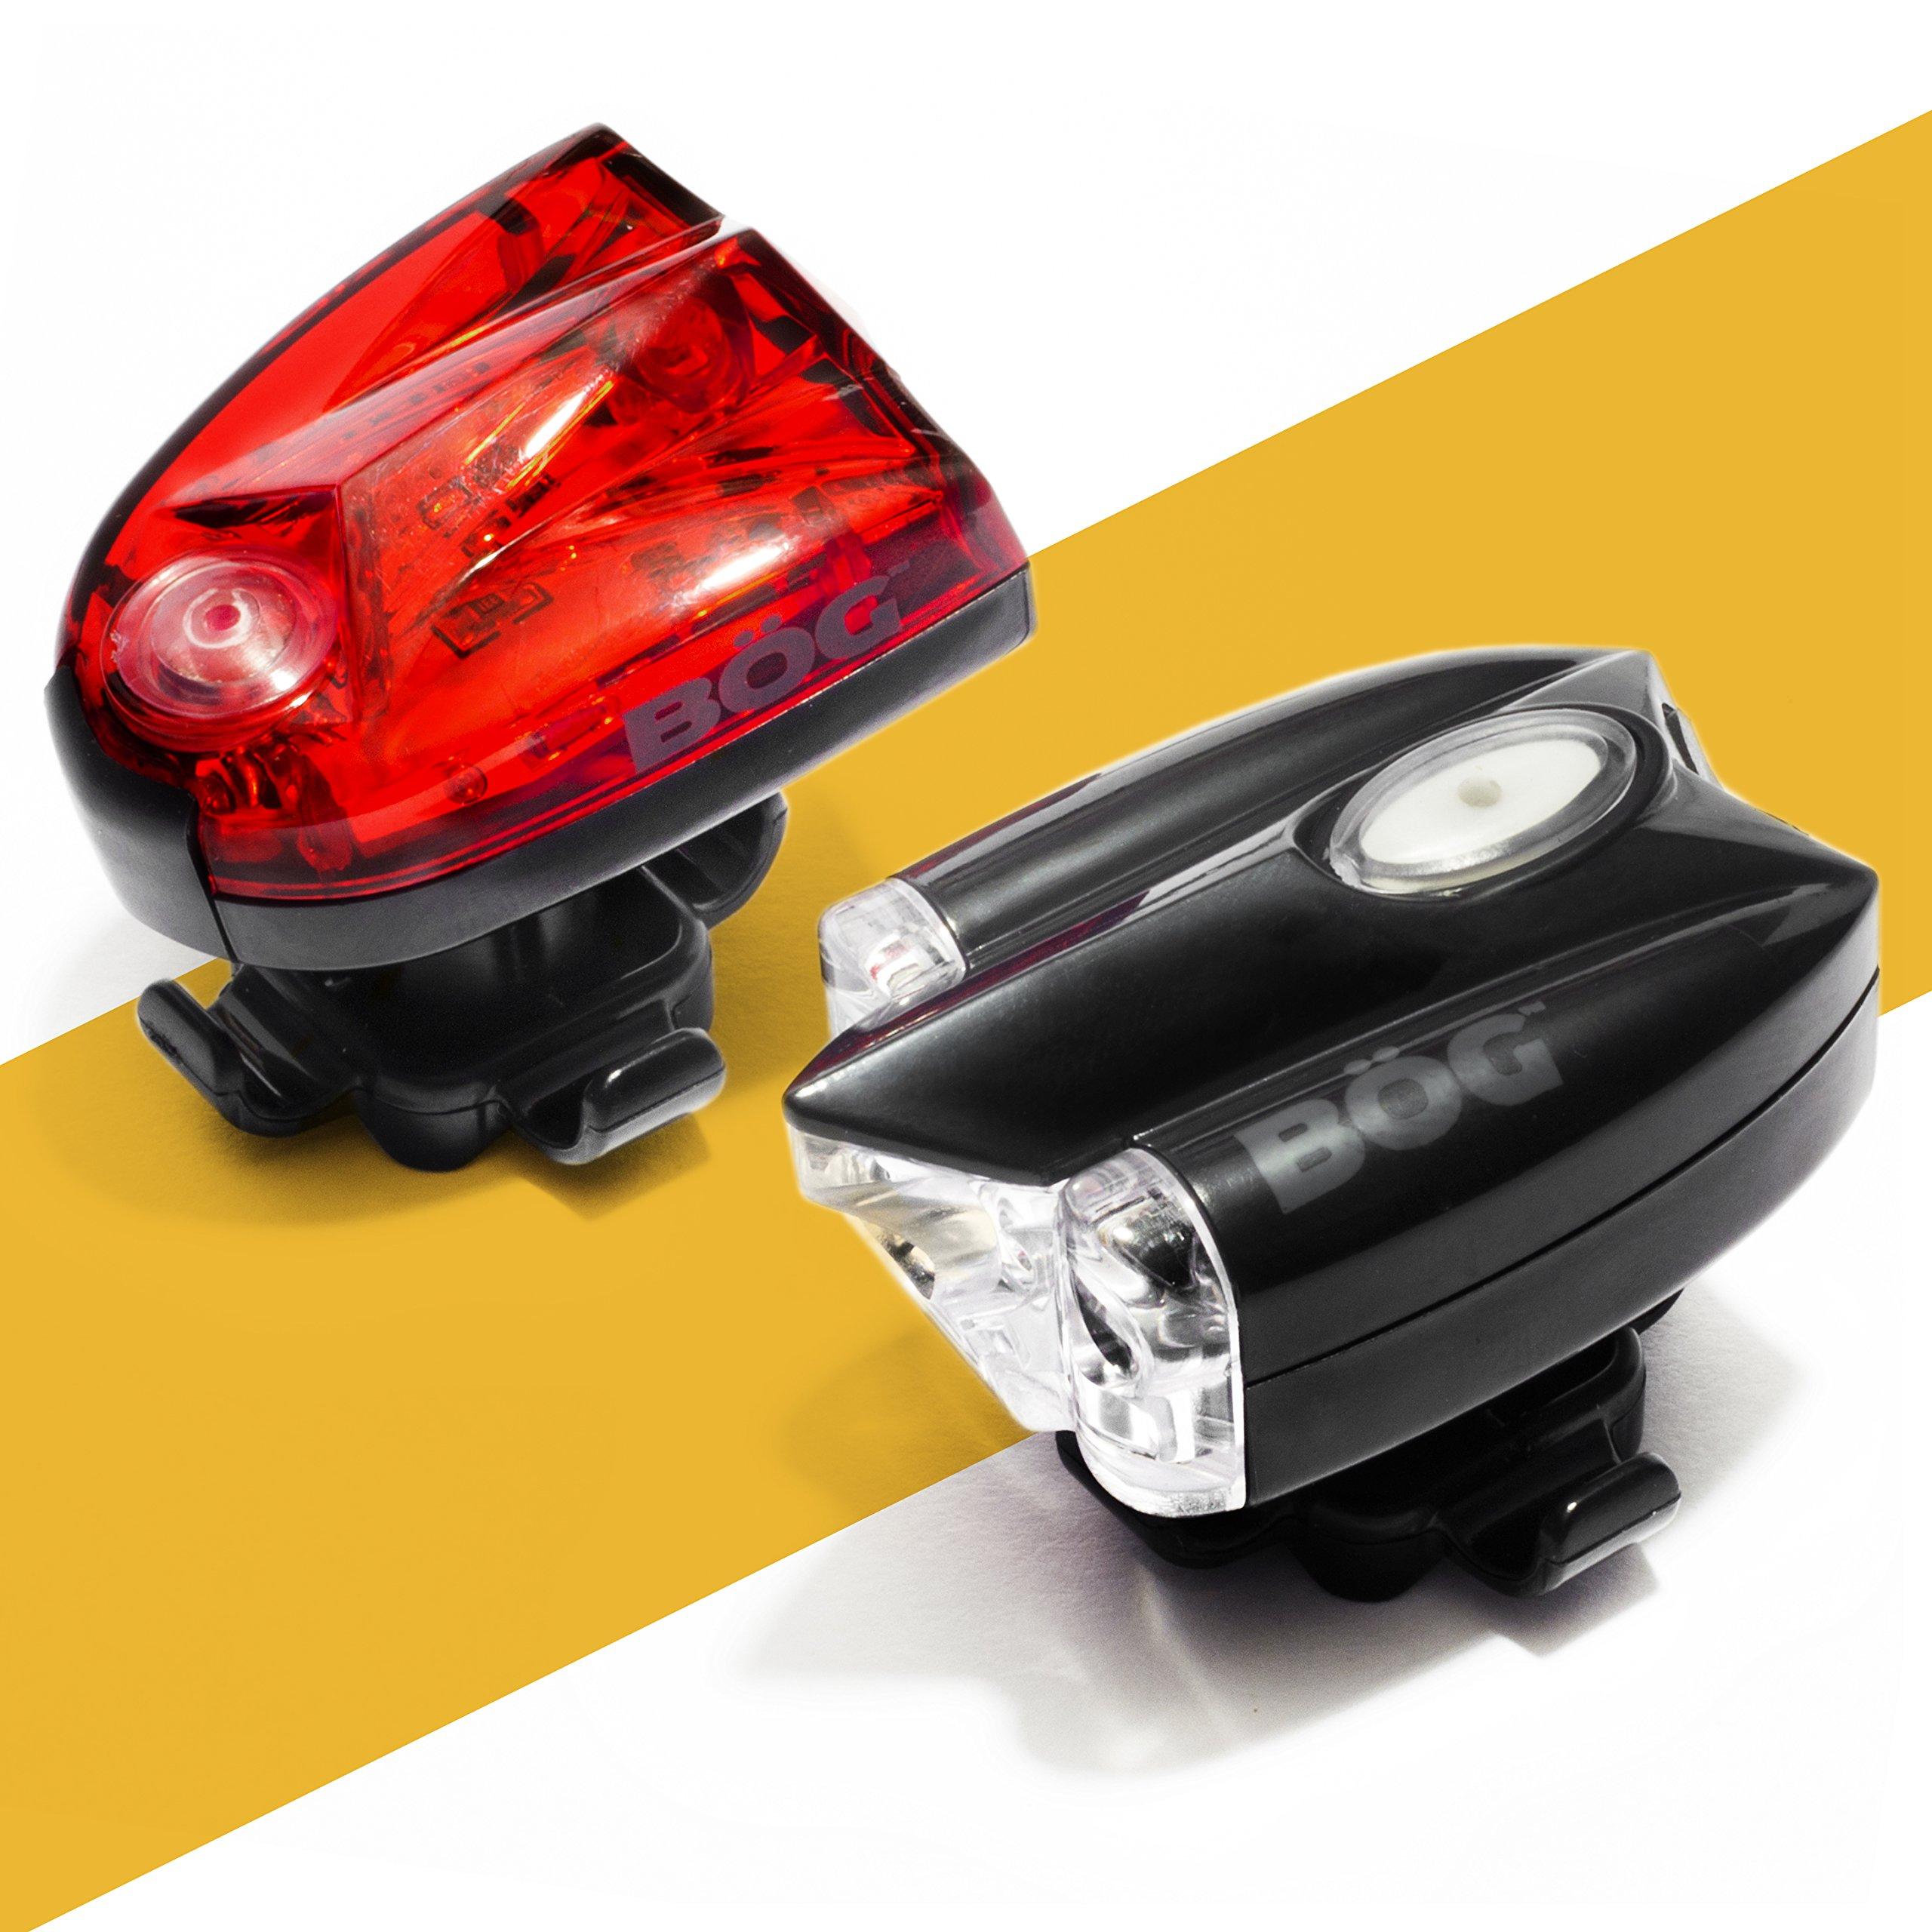 Usb Rechargeable Led Bike Light Set Headlight  U0026 Taillight